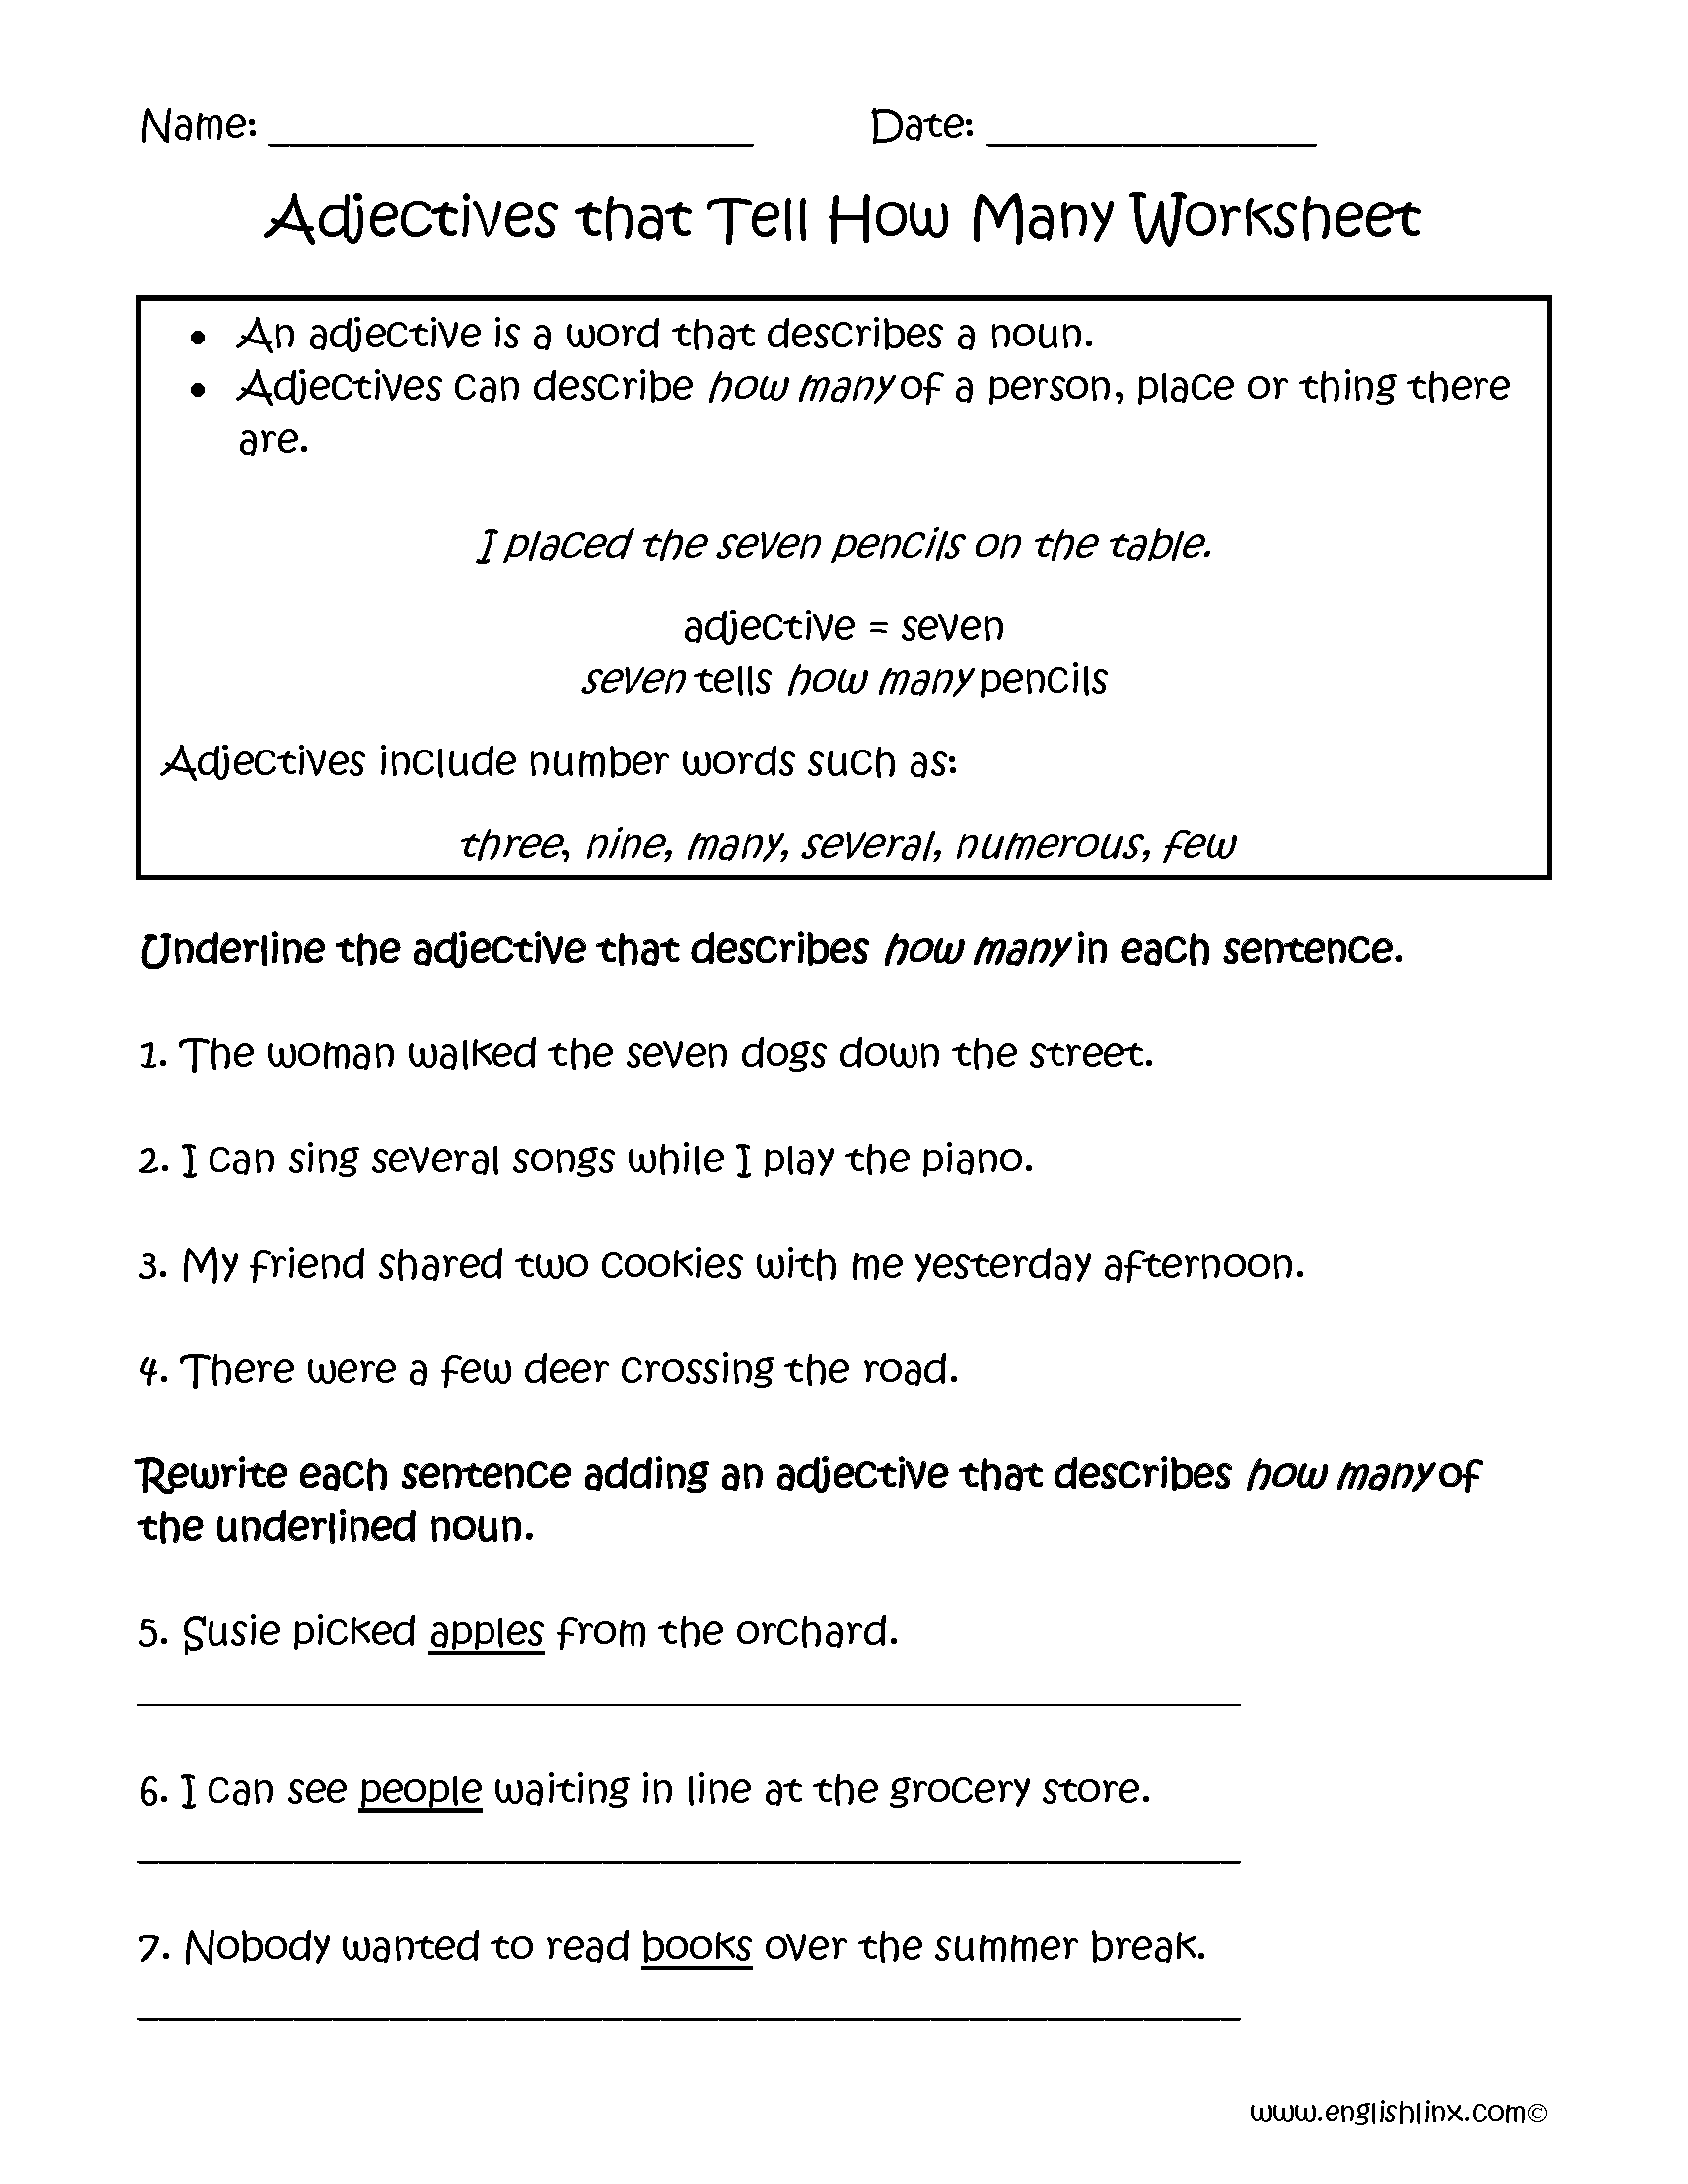 Predicate Noun And Adjective Worksheet